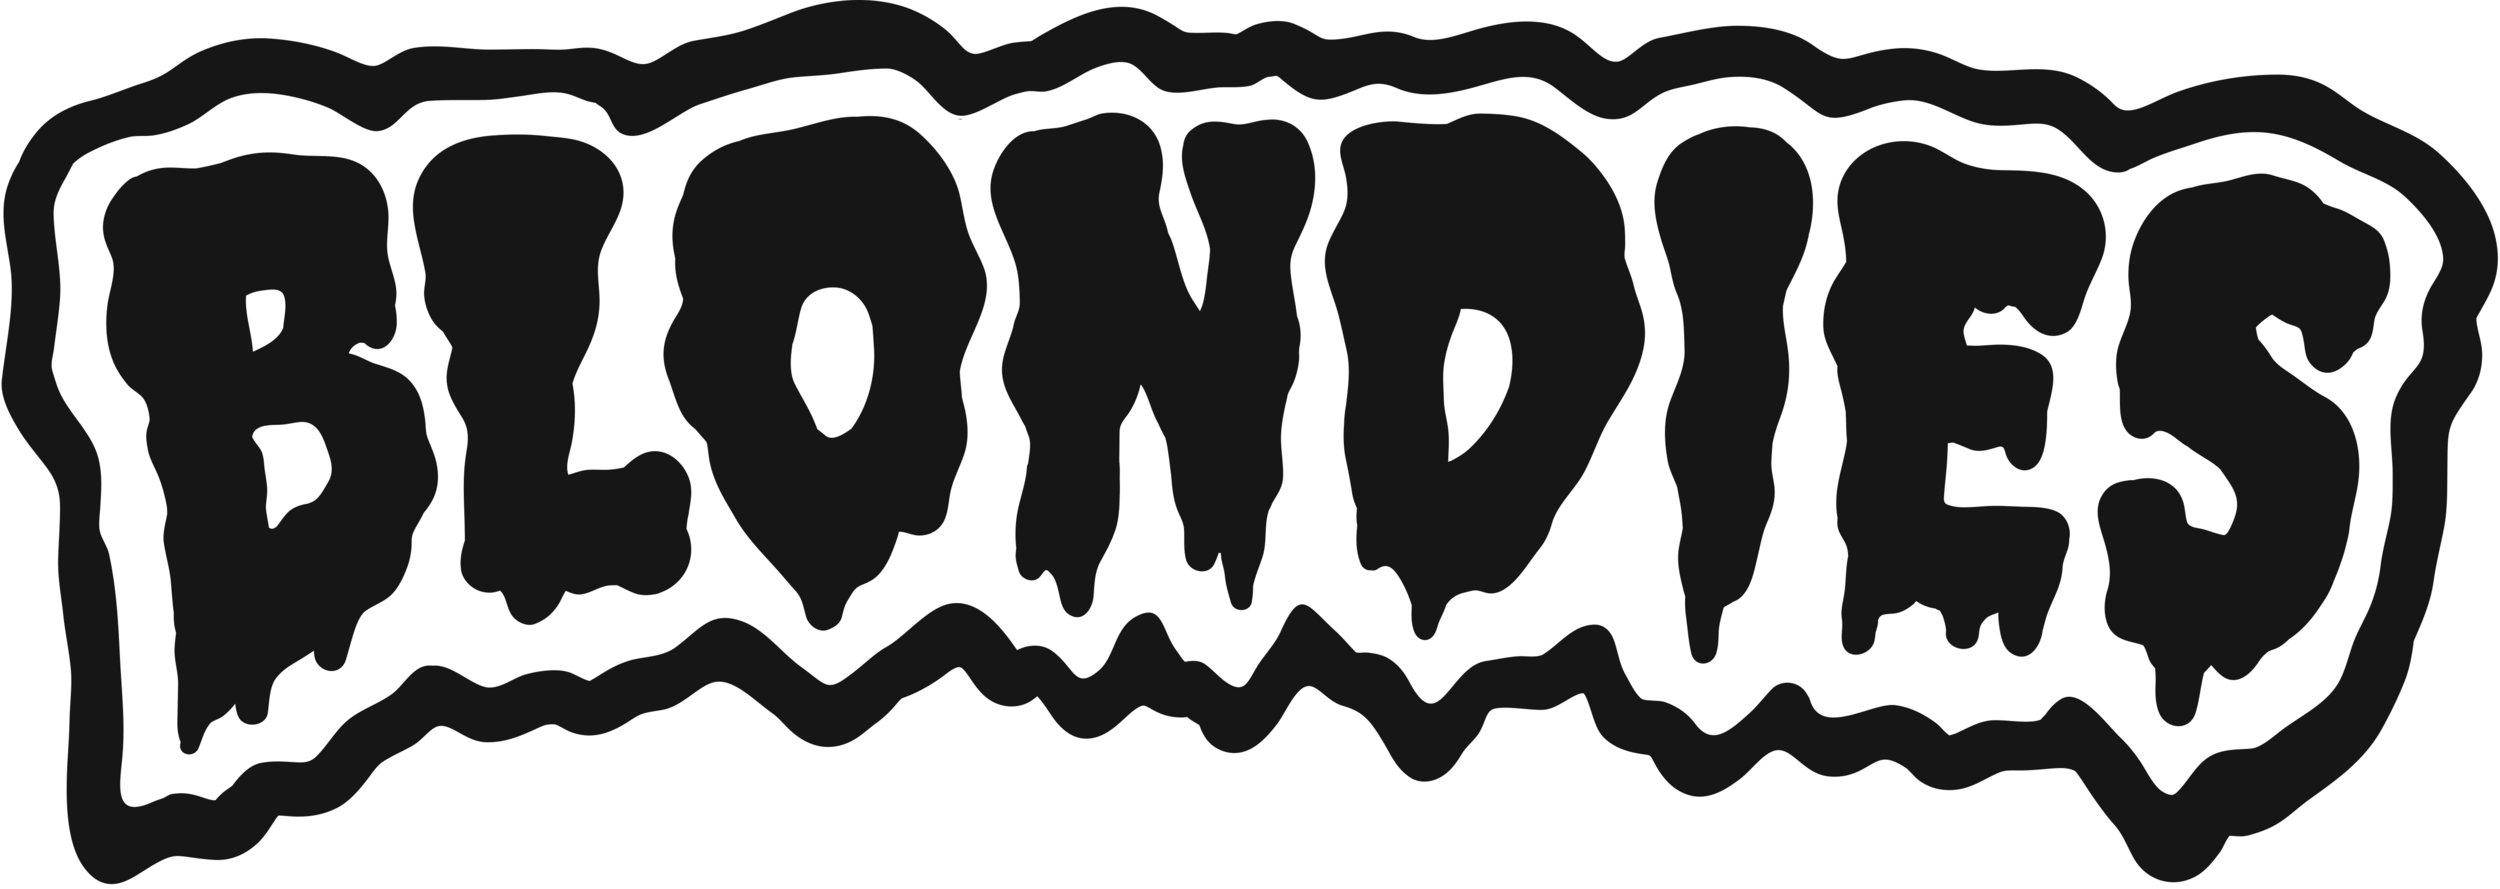 BLONDIES-LOGO-MAIN (1) copy.jpg